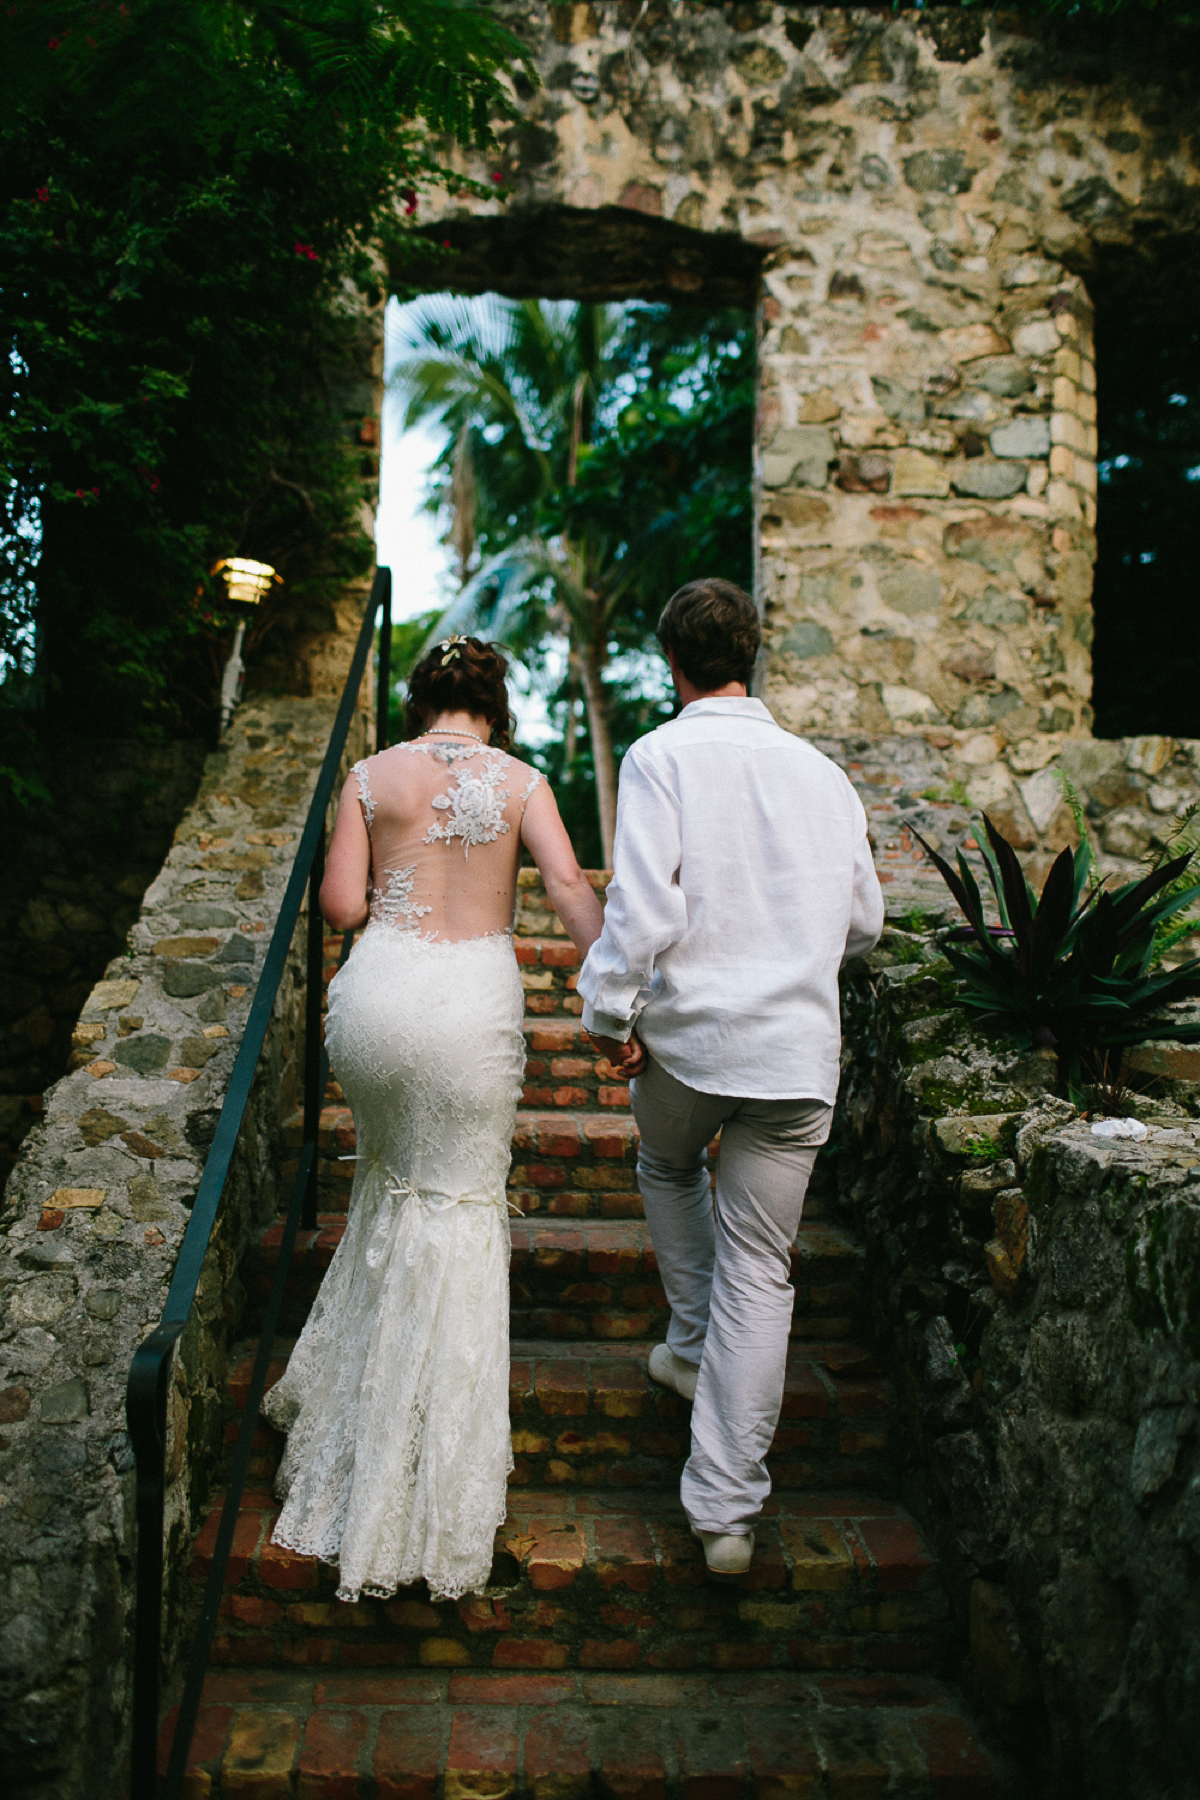 St_Croix_Wedding_Abi_Q_Photography_-163.jpg